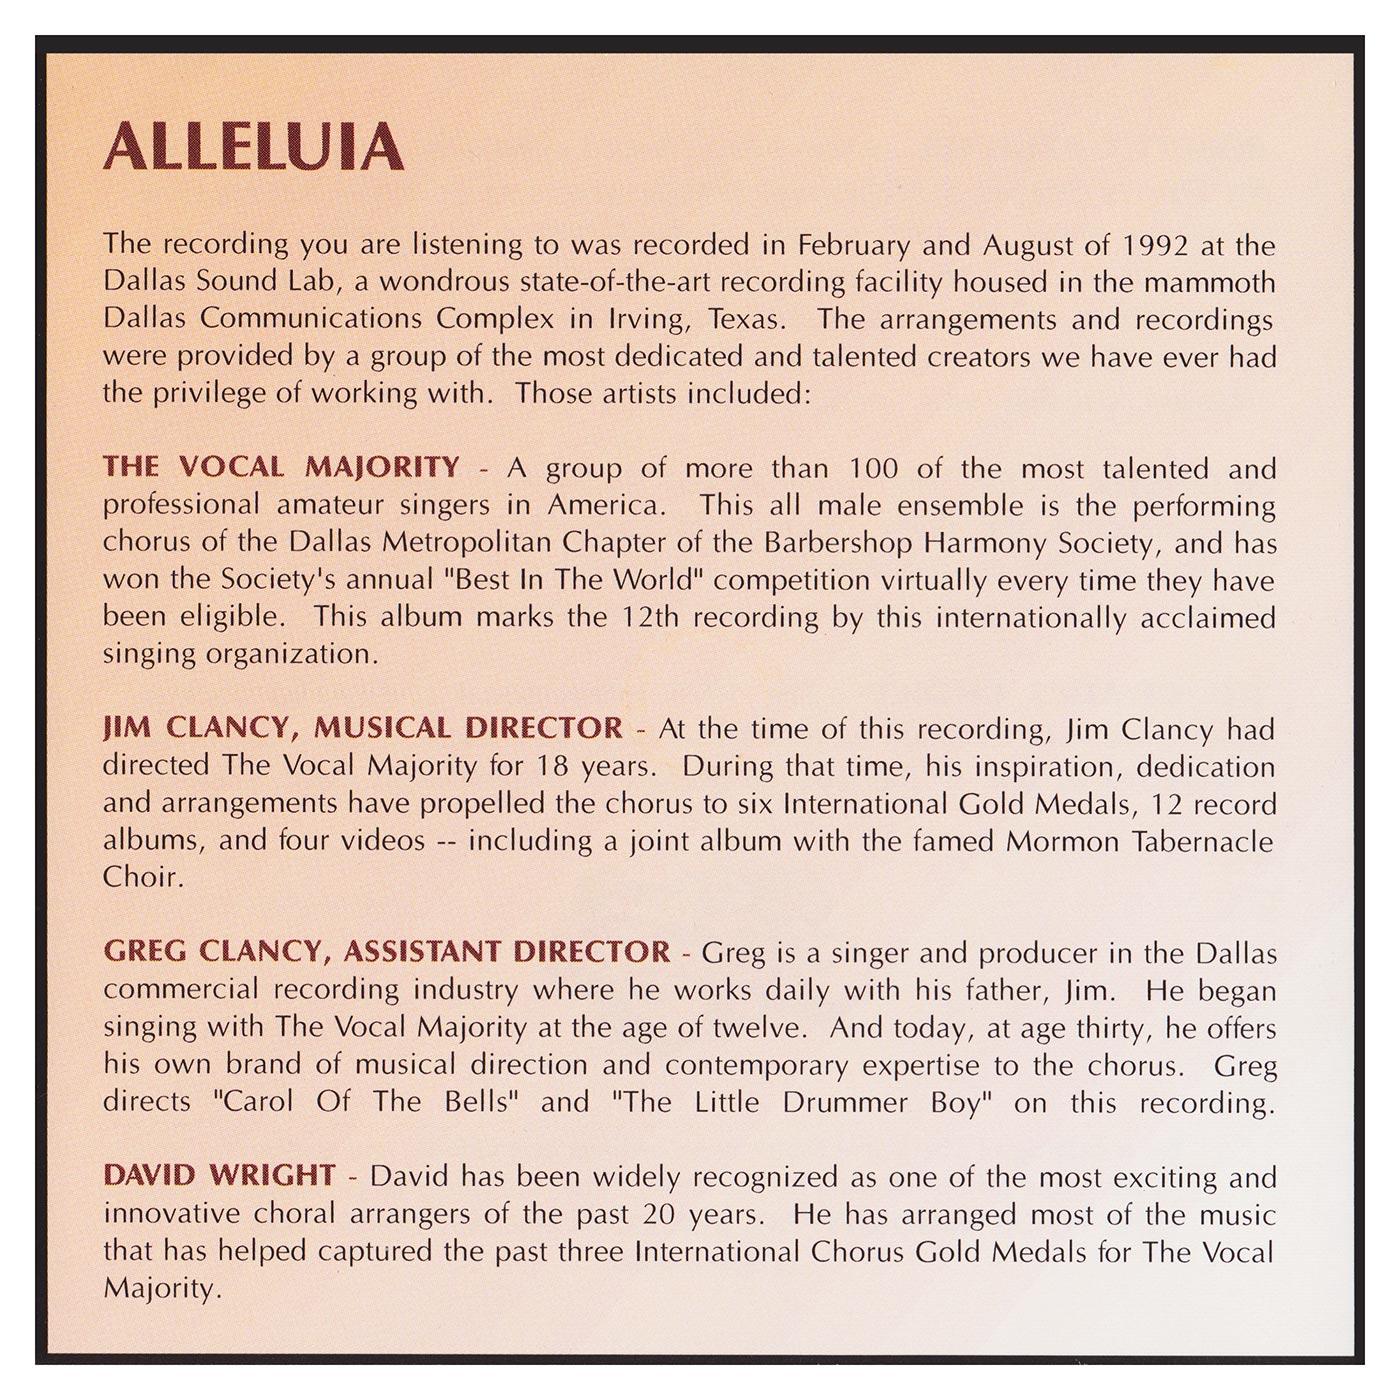 Back Panel: Alleluia